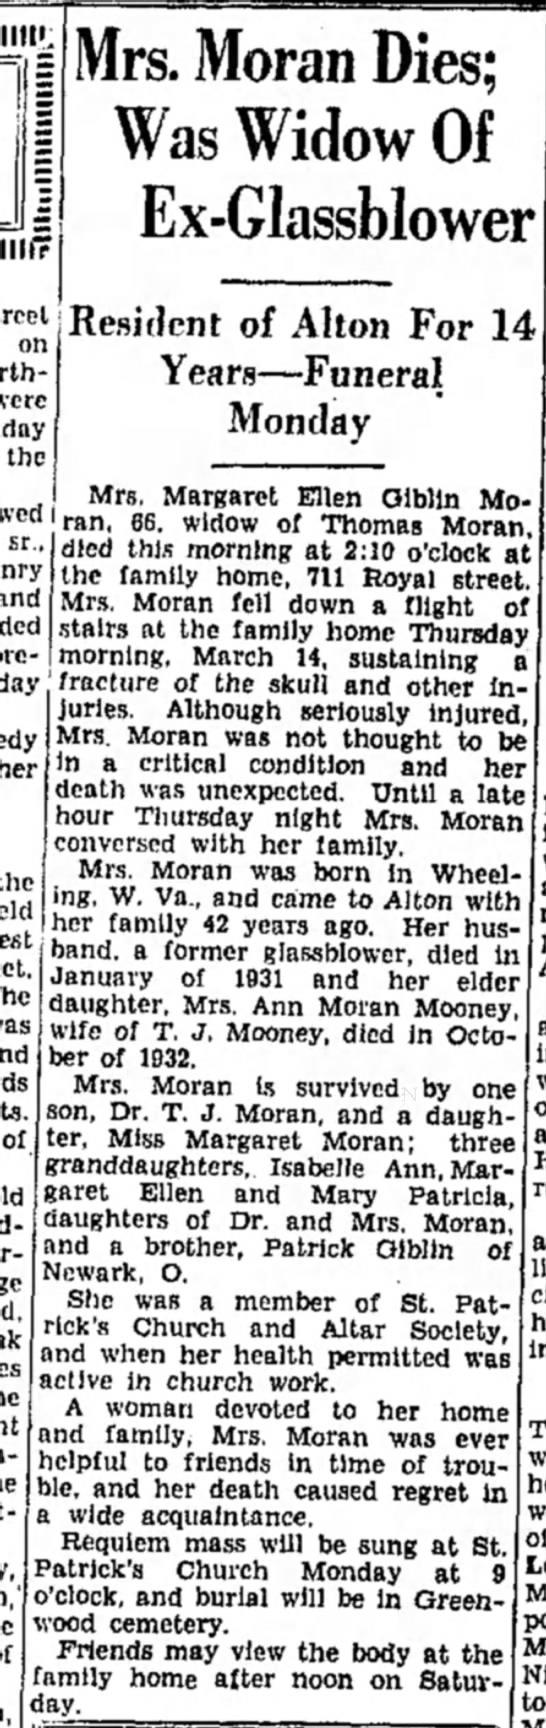 Giblin_Margaret_Obit_1935_(Moran) -